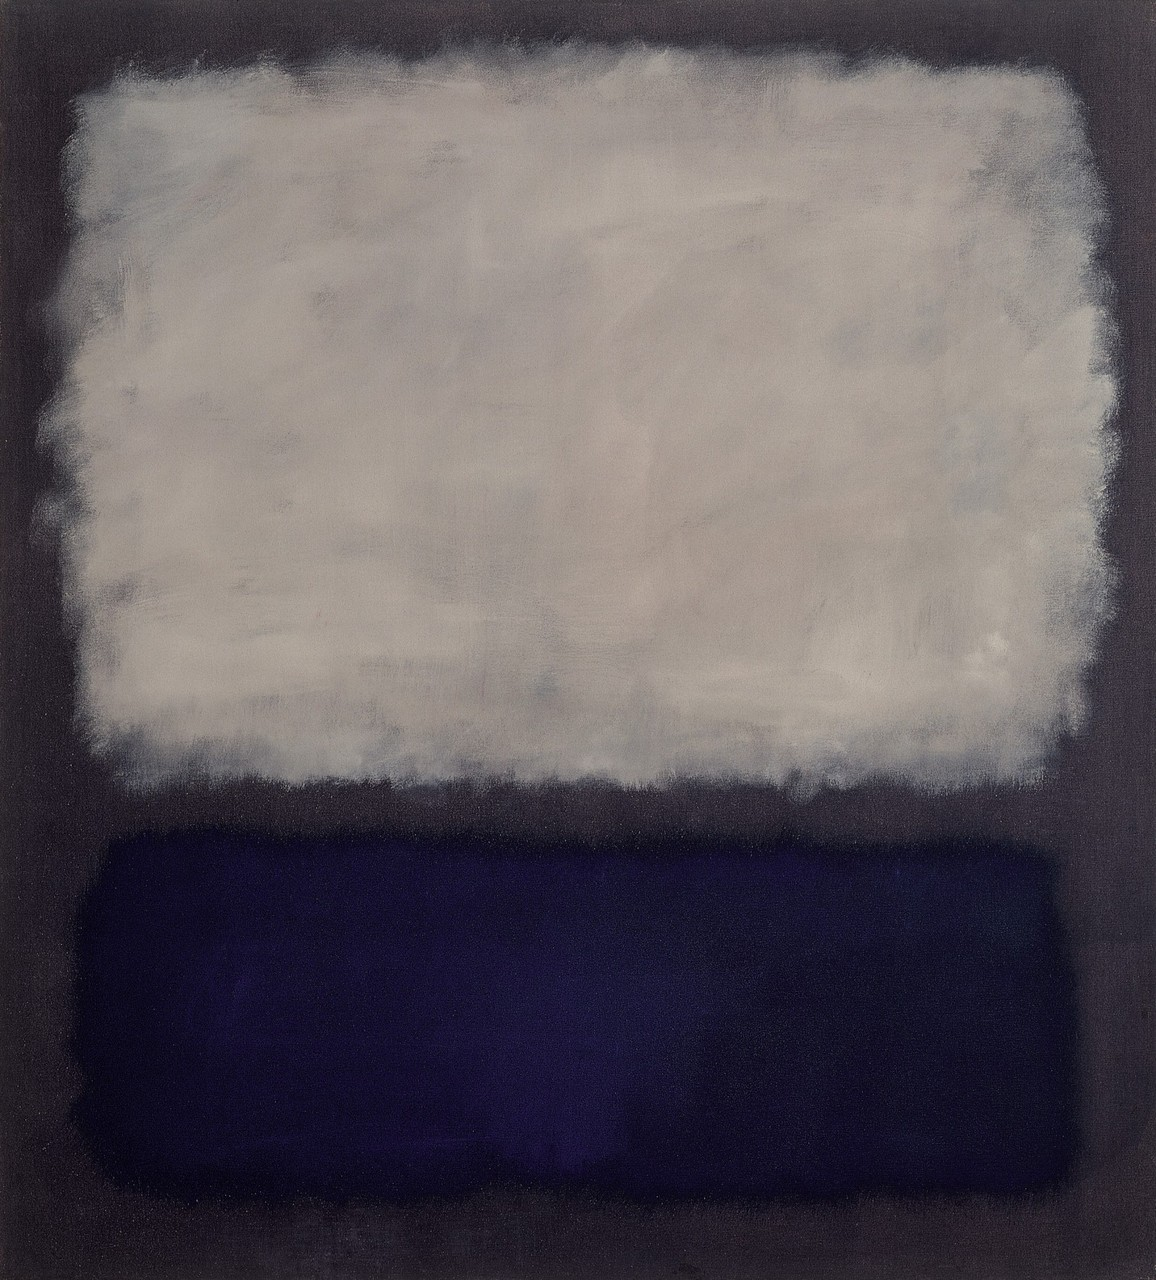 phong-cach-noi-that-minimalism-la-gi  (2)